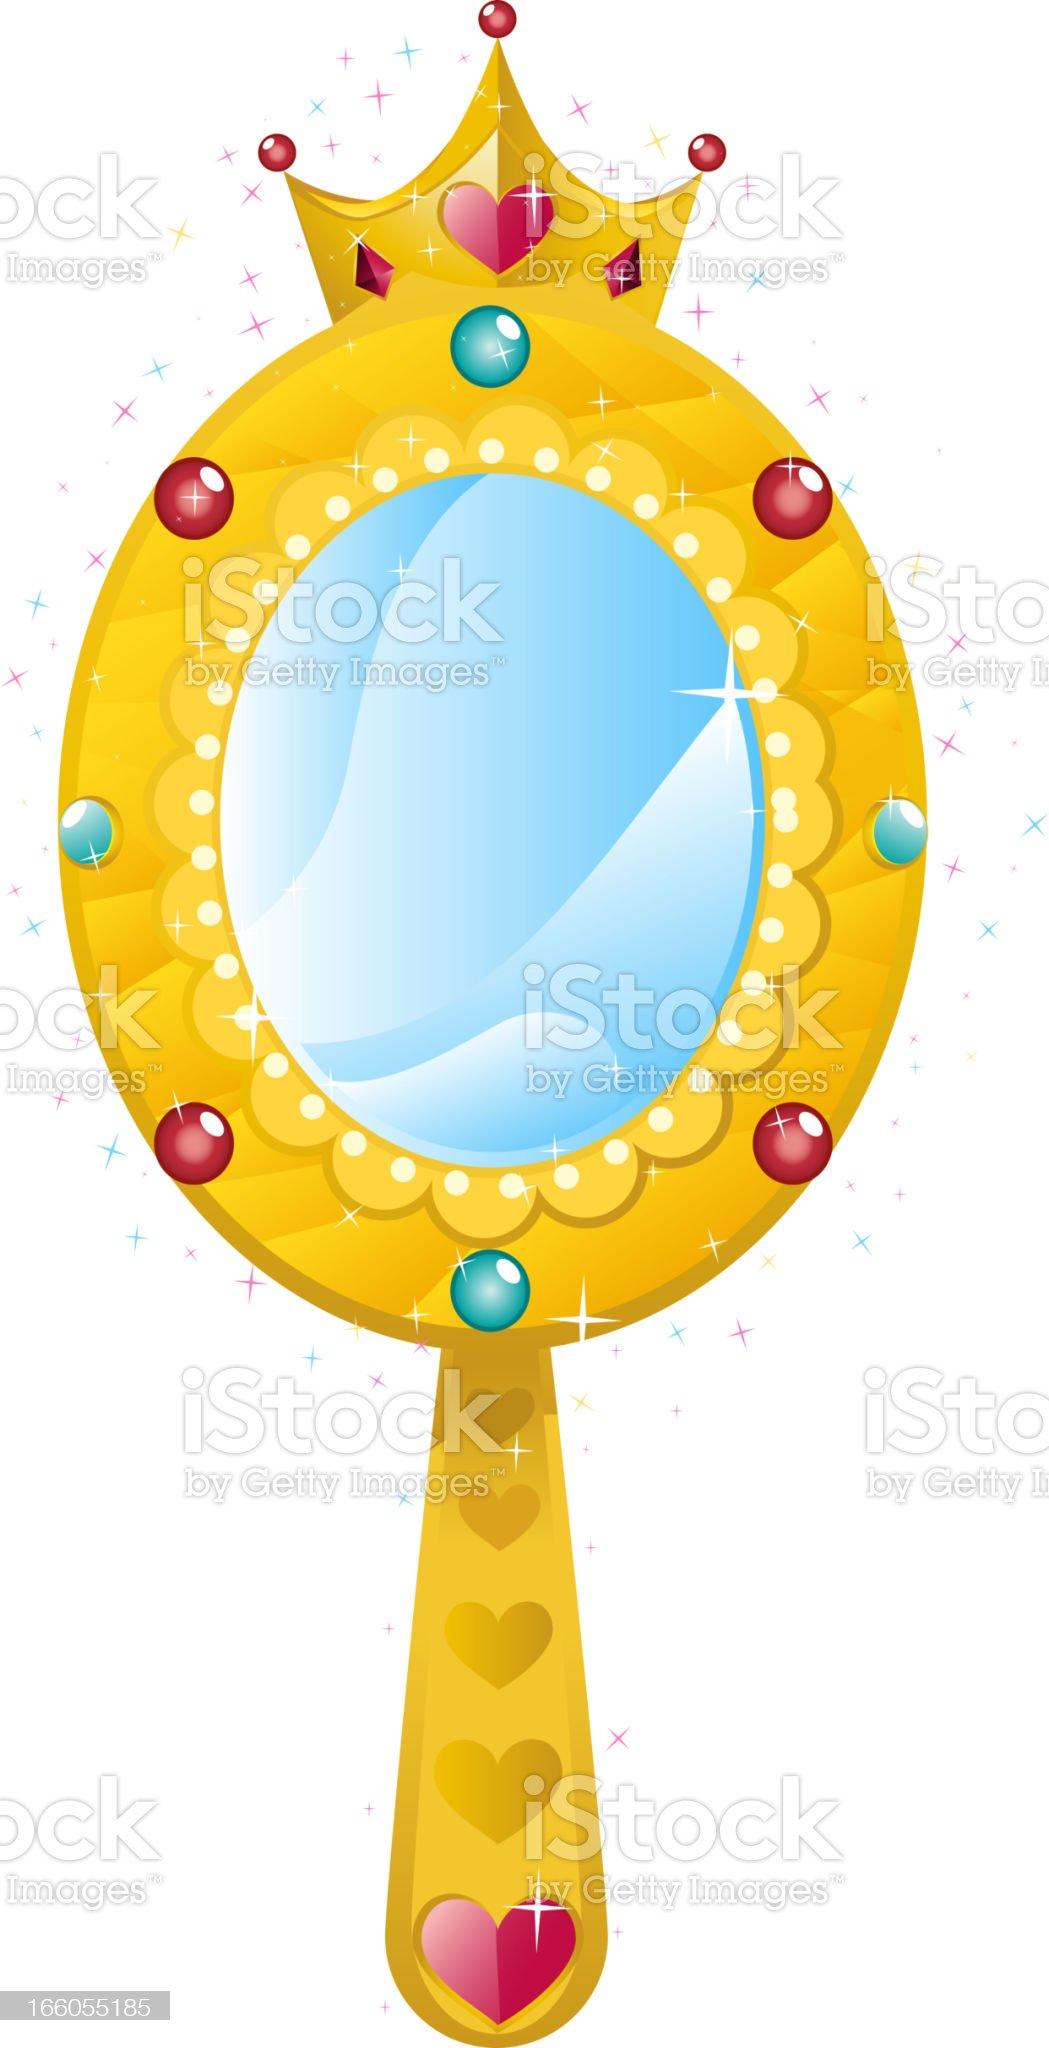 Princess magic mirror with shining hearts and diamonds royalty-free stock vector art